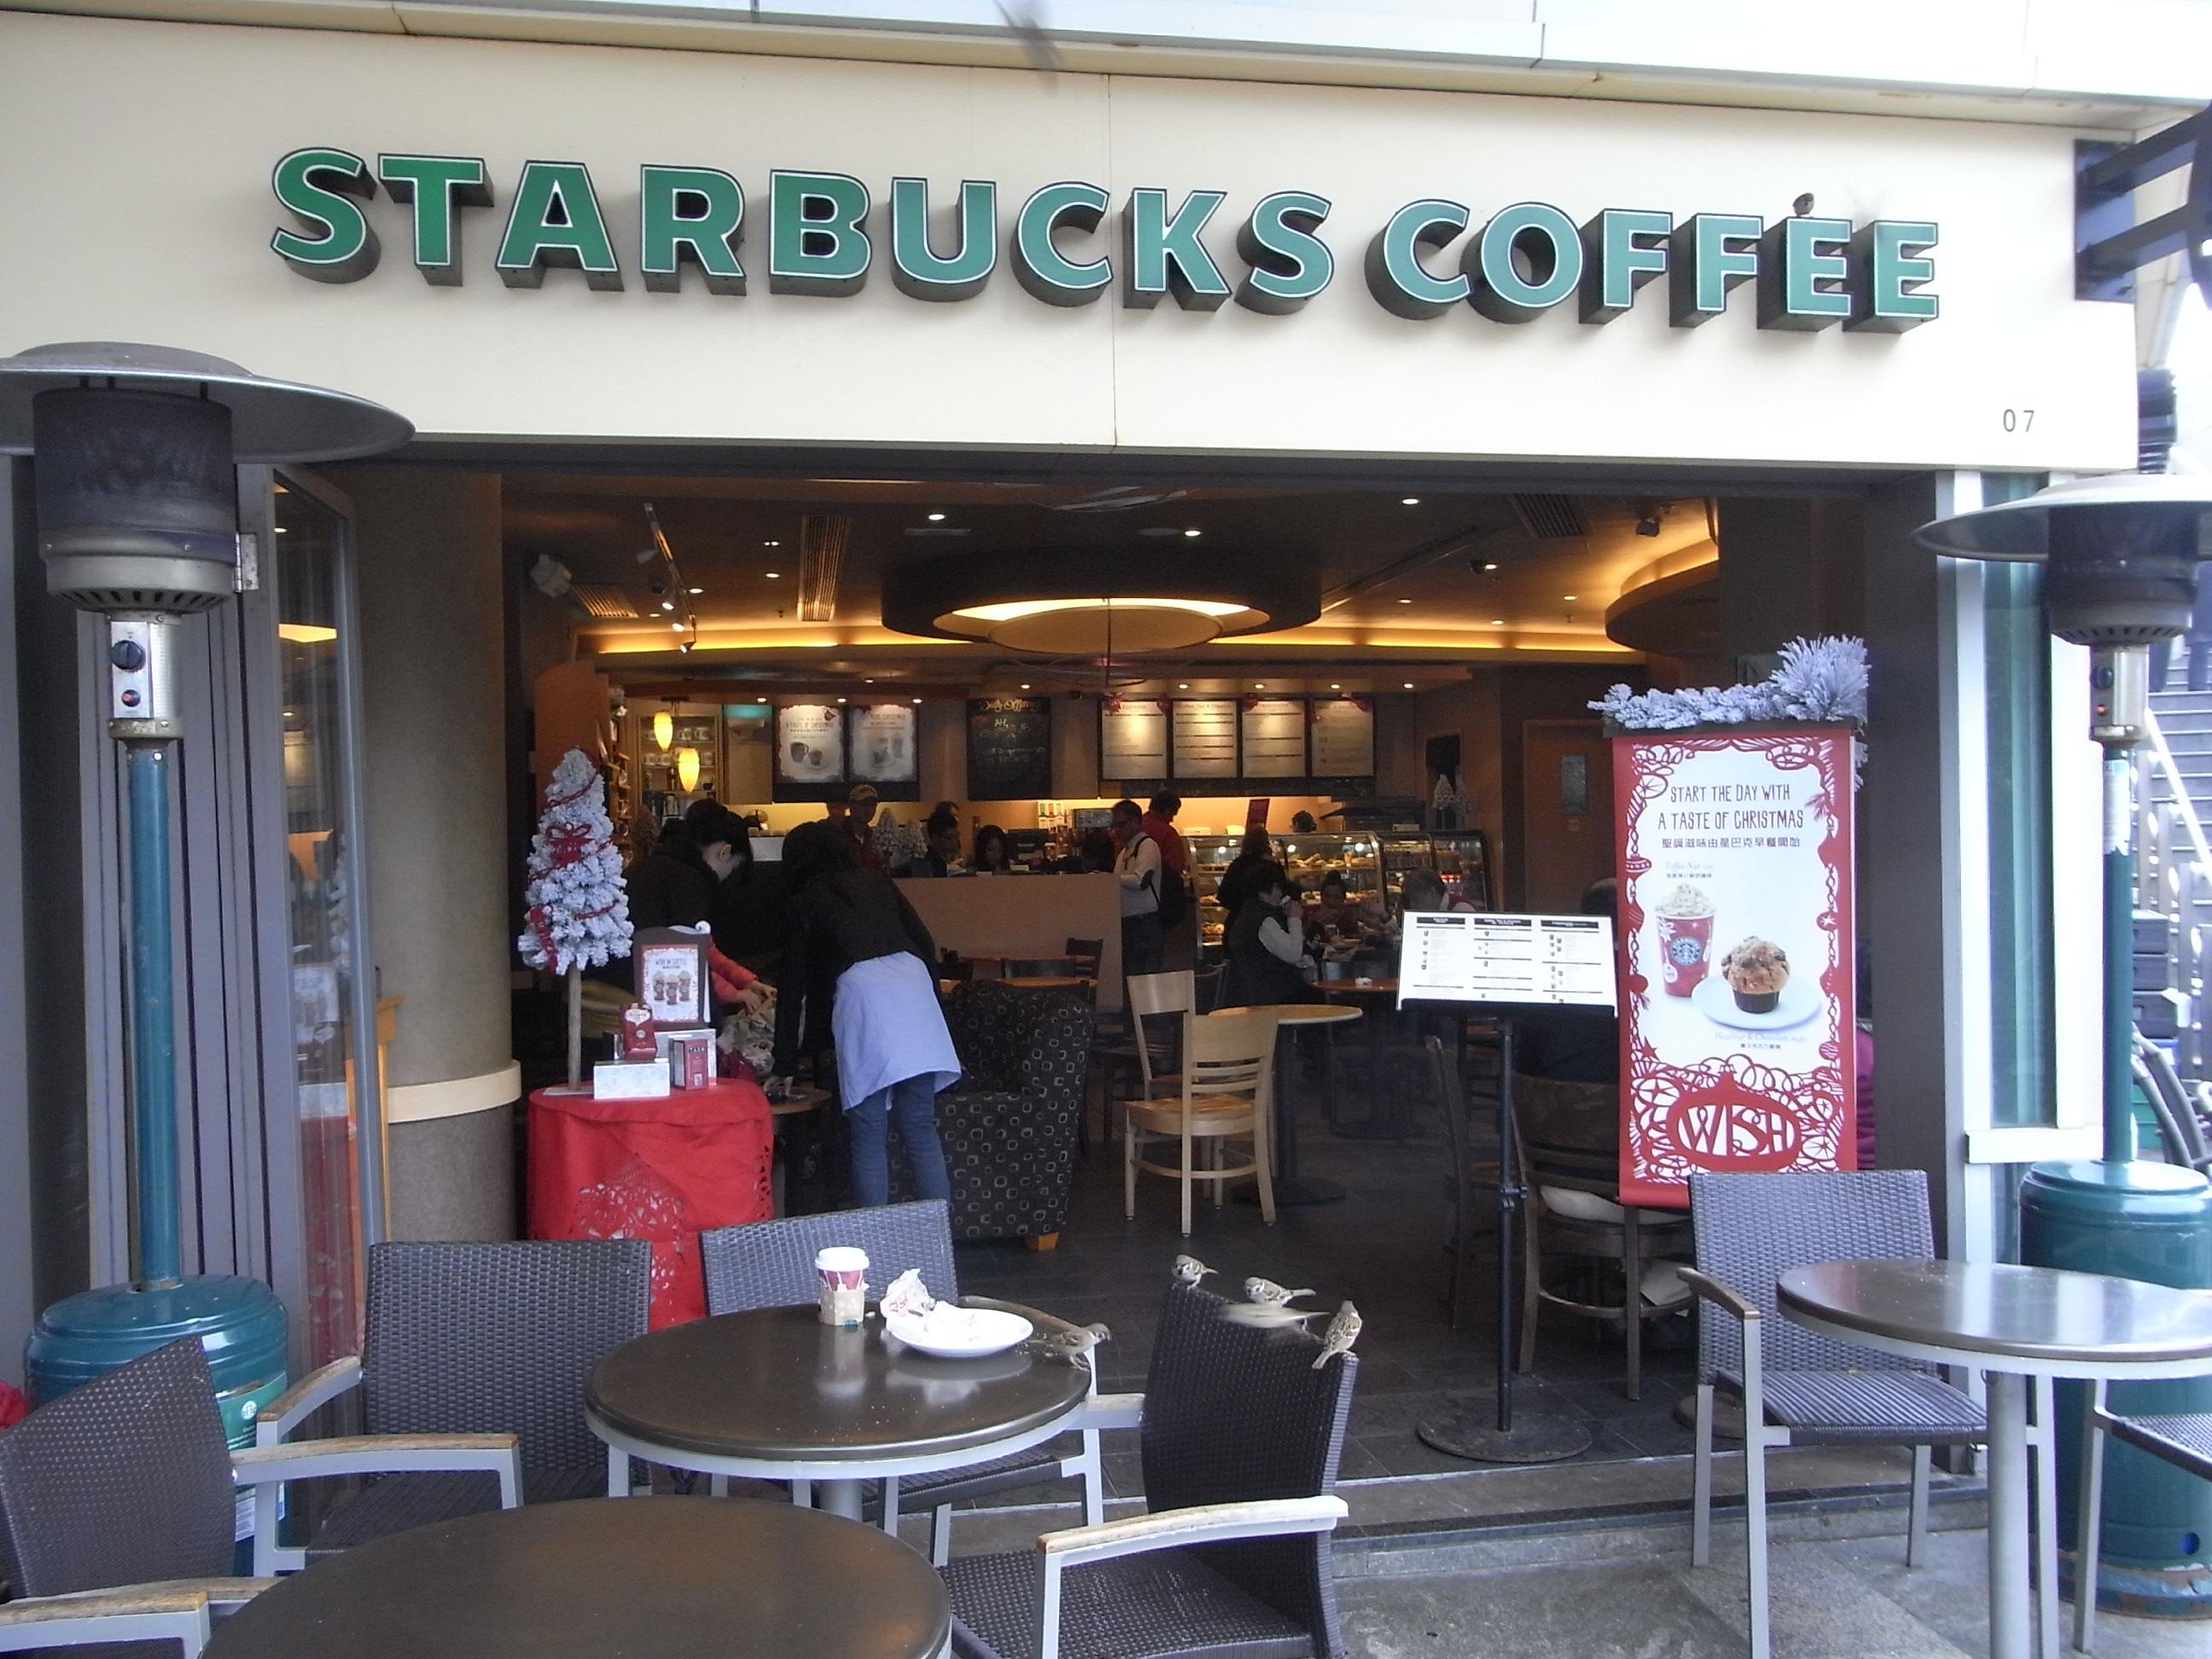 Filehk Peak Galleria 山頂廣場 Starbucks Coffee 1jpg Wikimedia